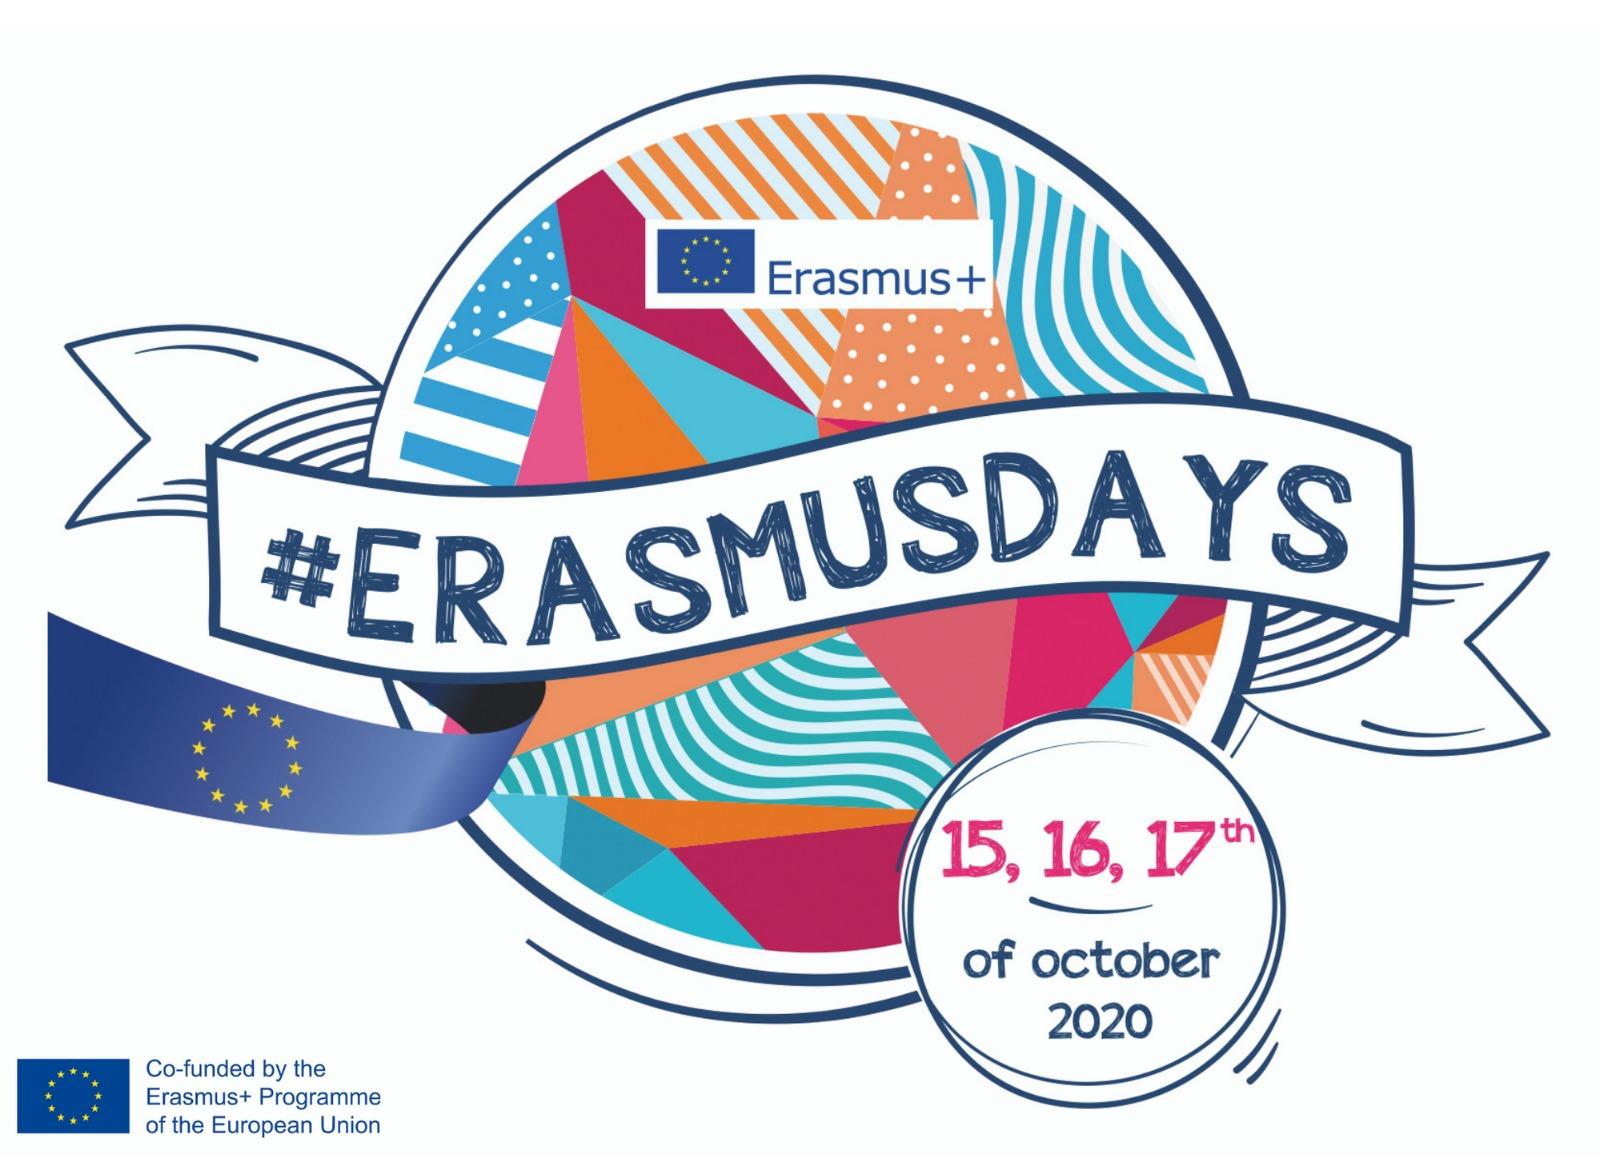 ERASMUSDAYS